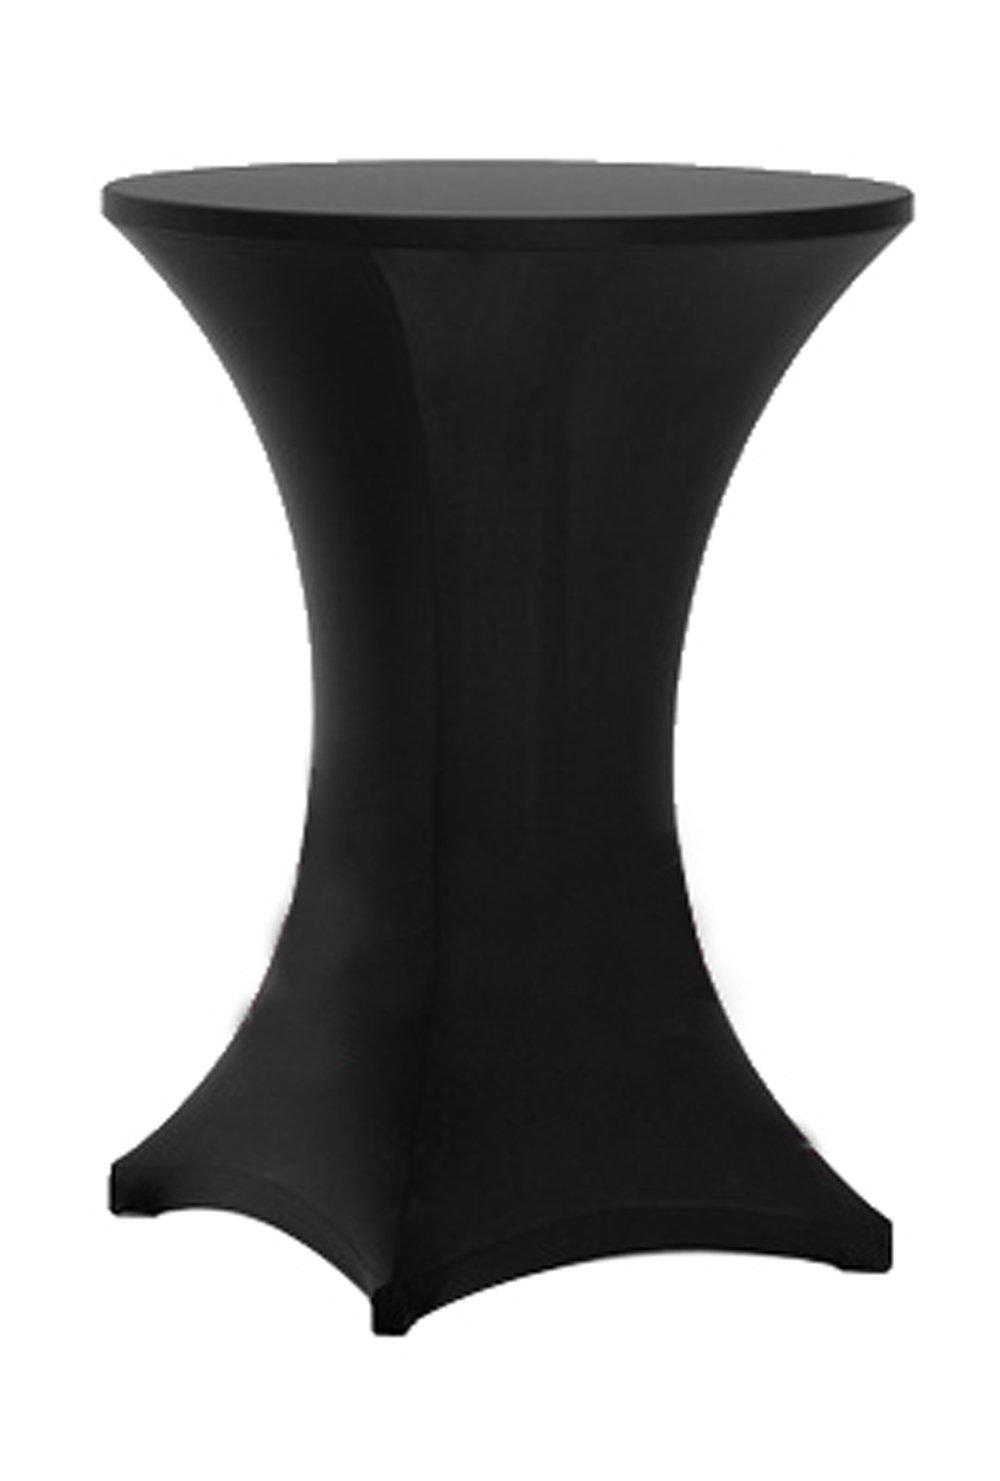 Tina's 32x43 Cocktail Spandex Stretch Square Corners Tablecloth Black